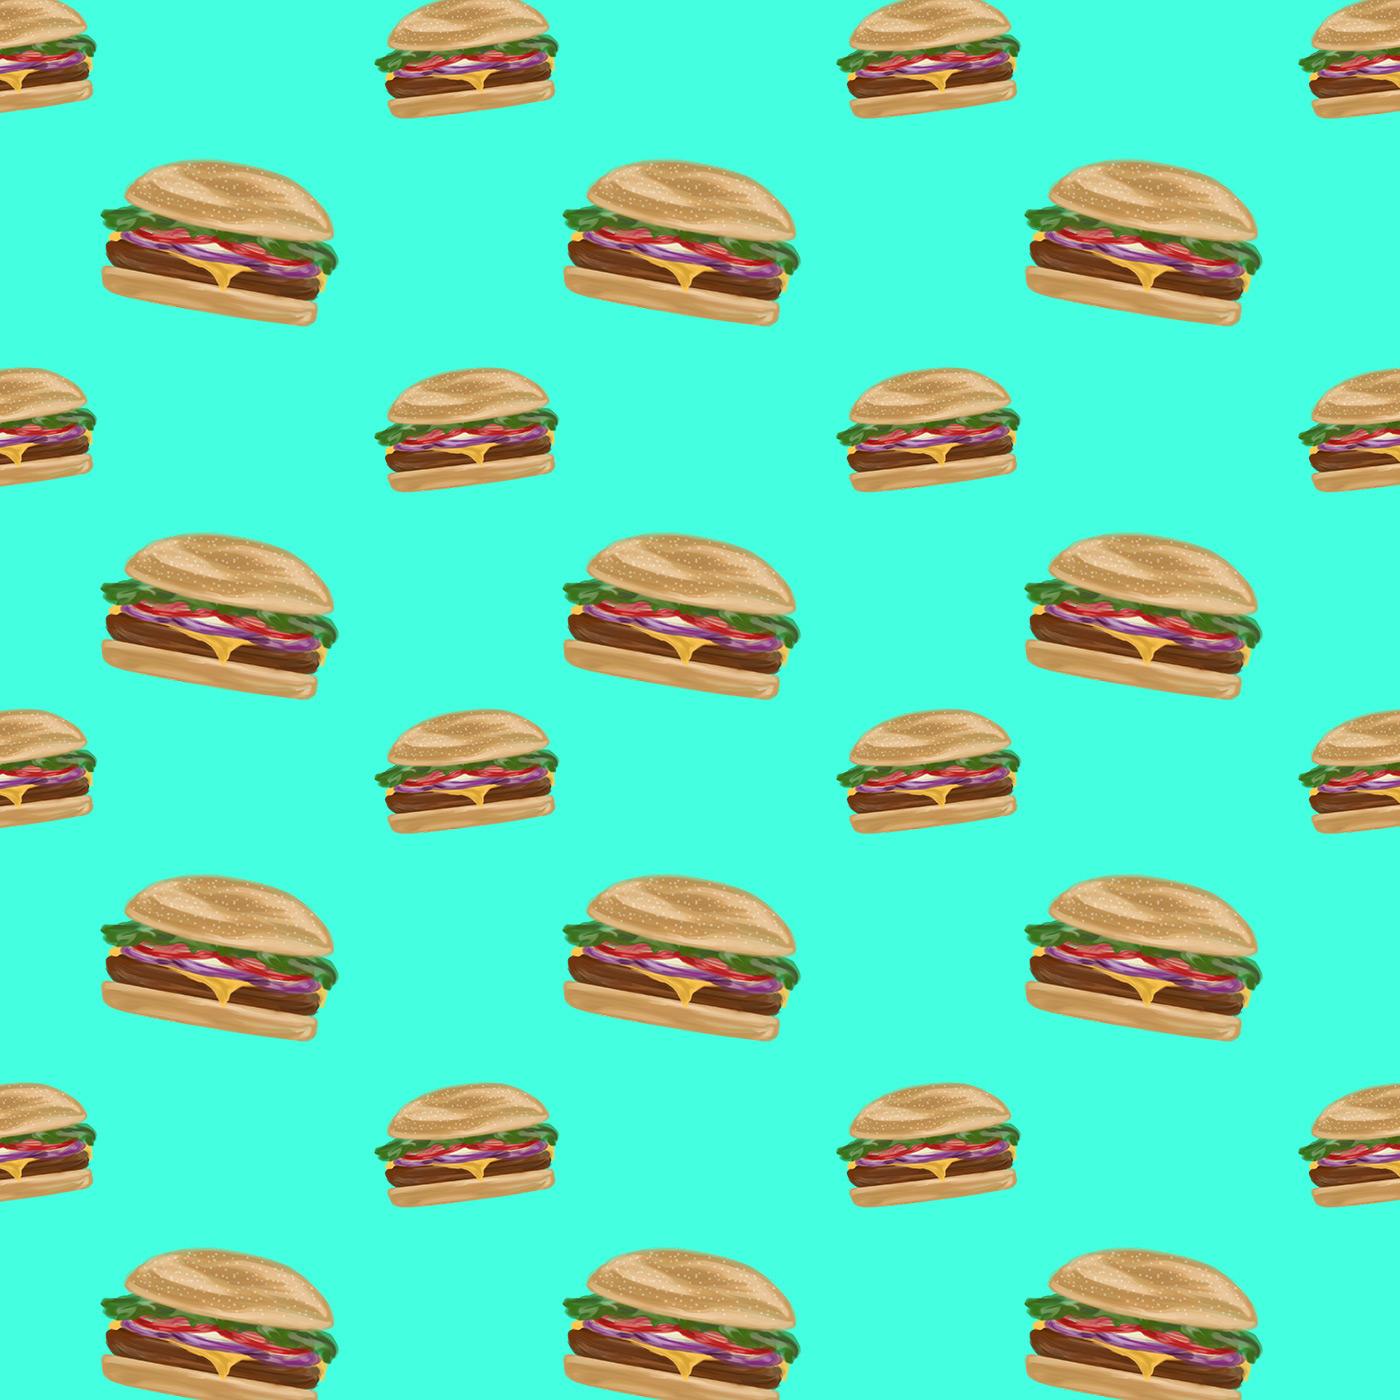 cheeseburger-web.jpg